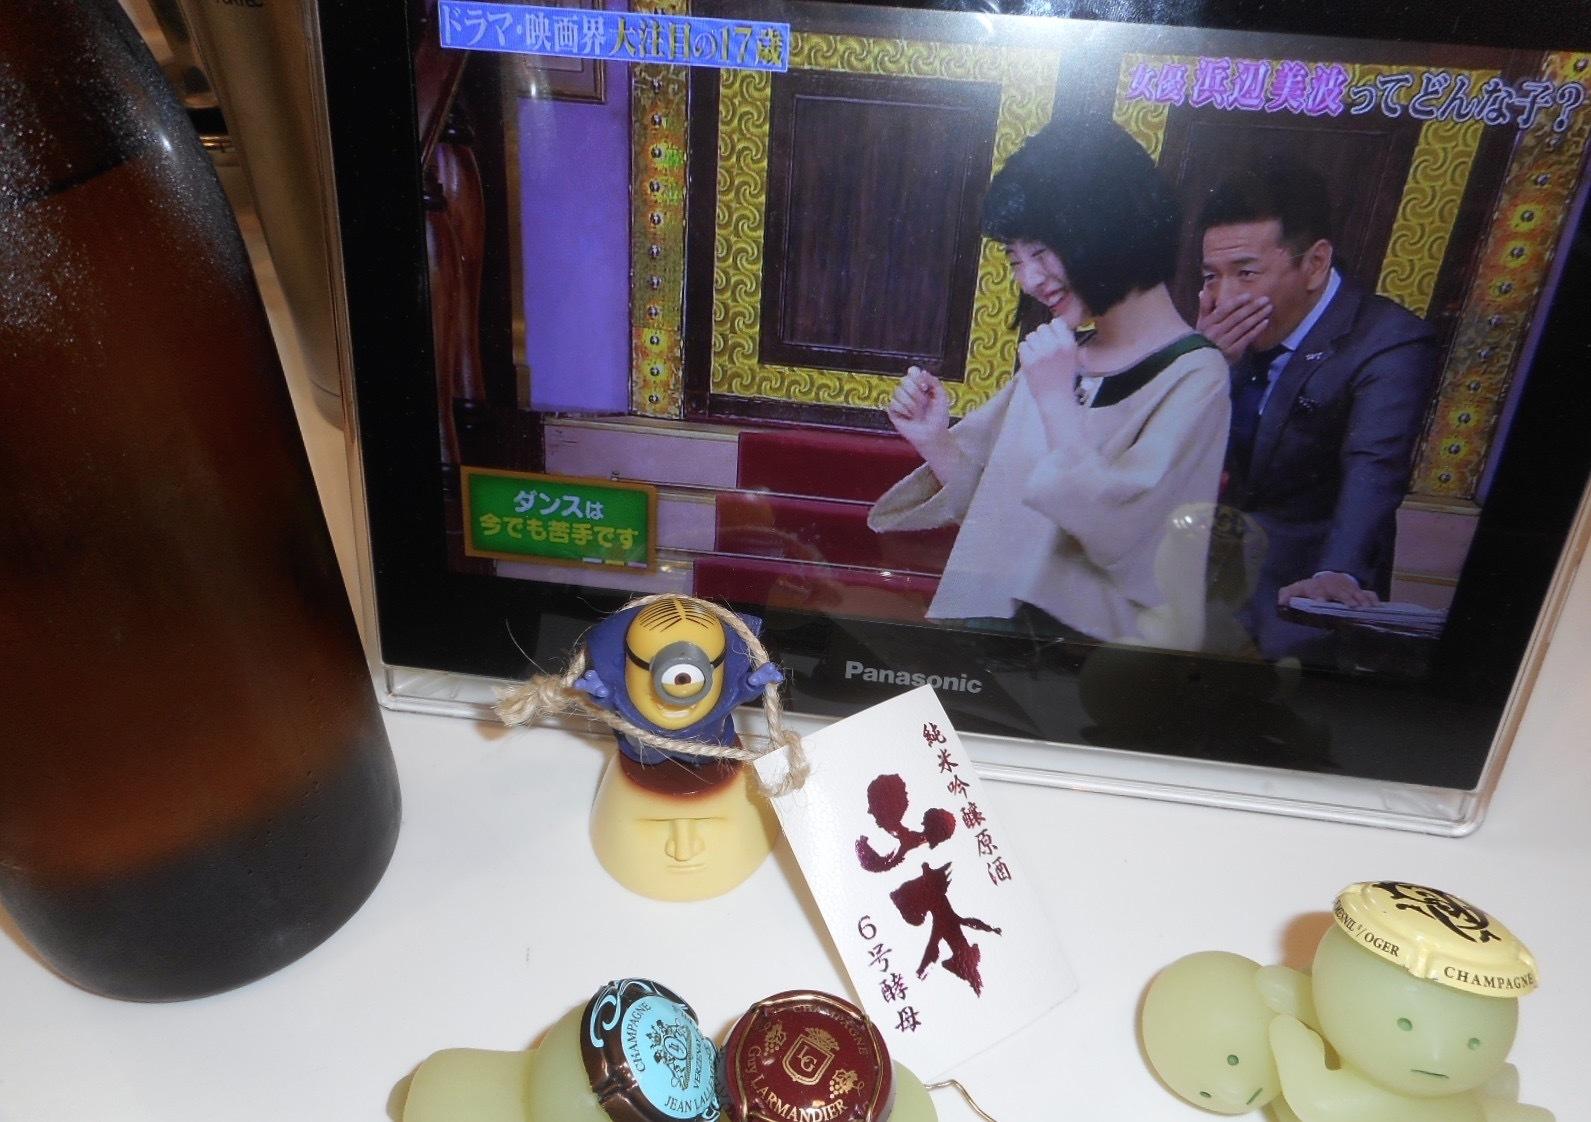 yamamoto_6gou29by5.jpg